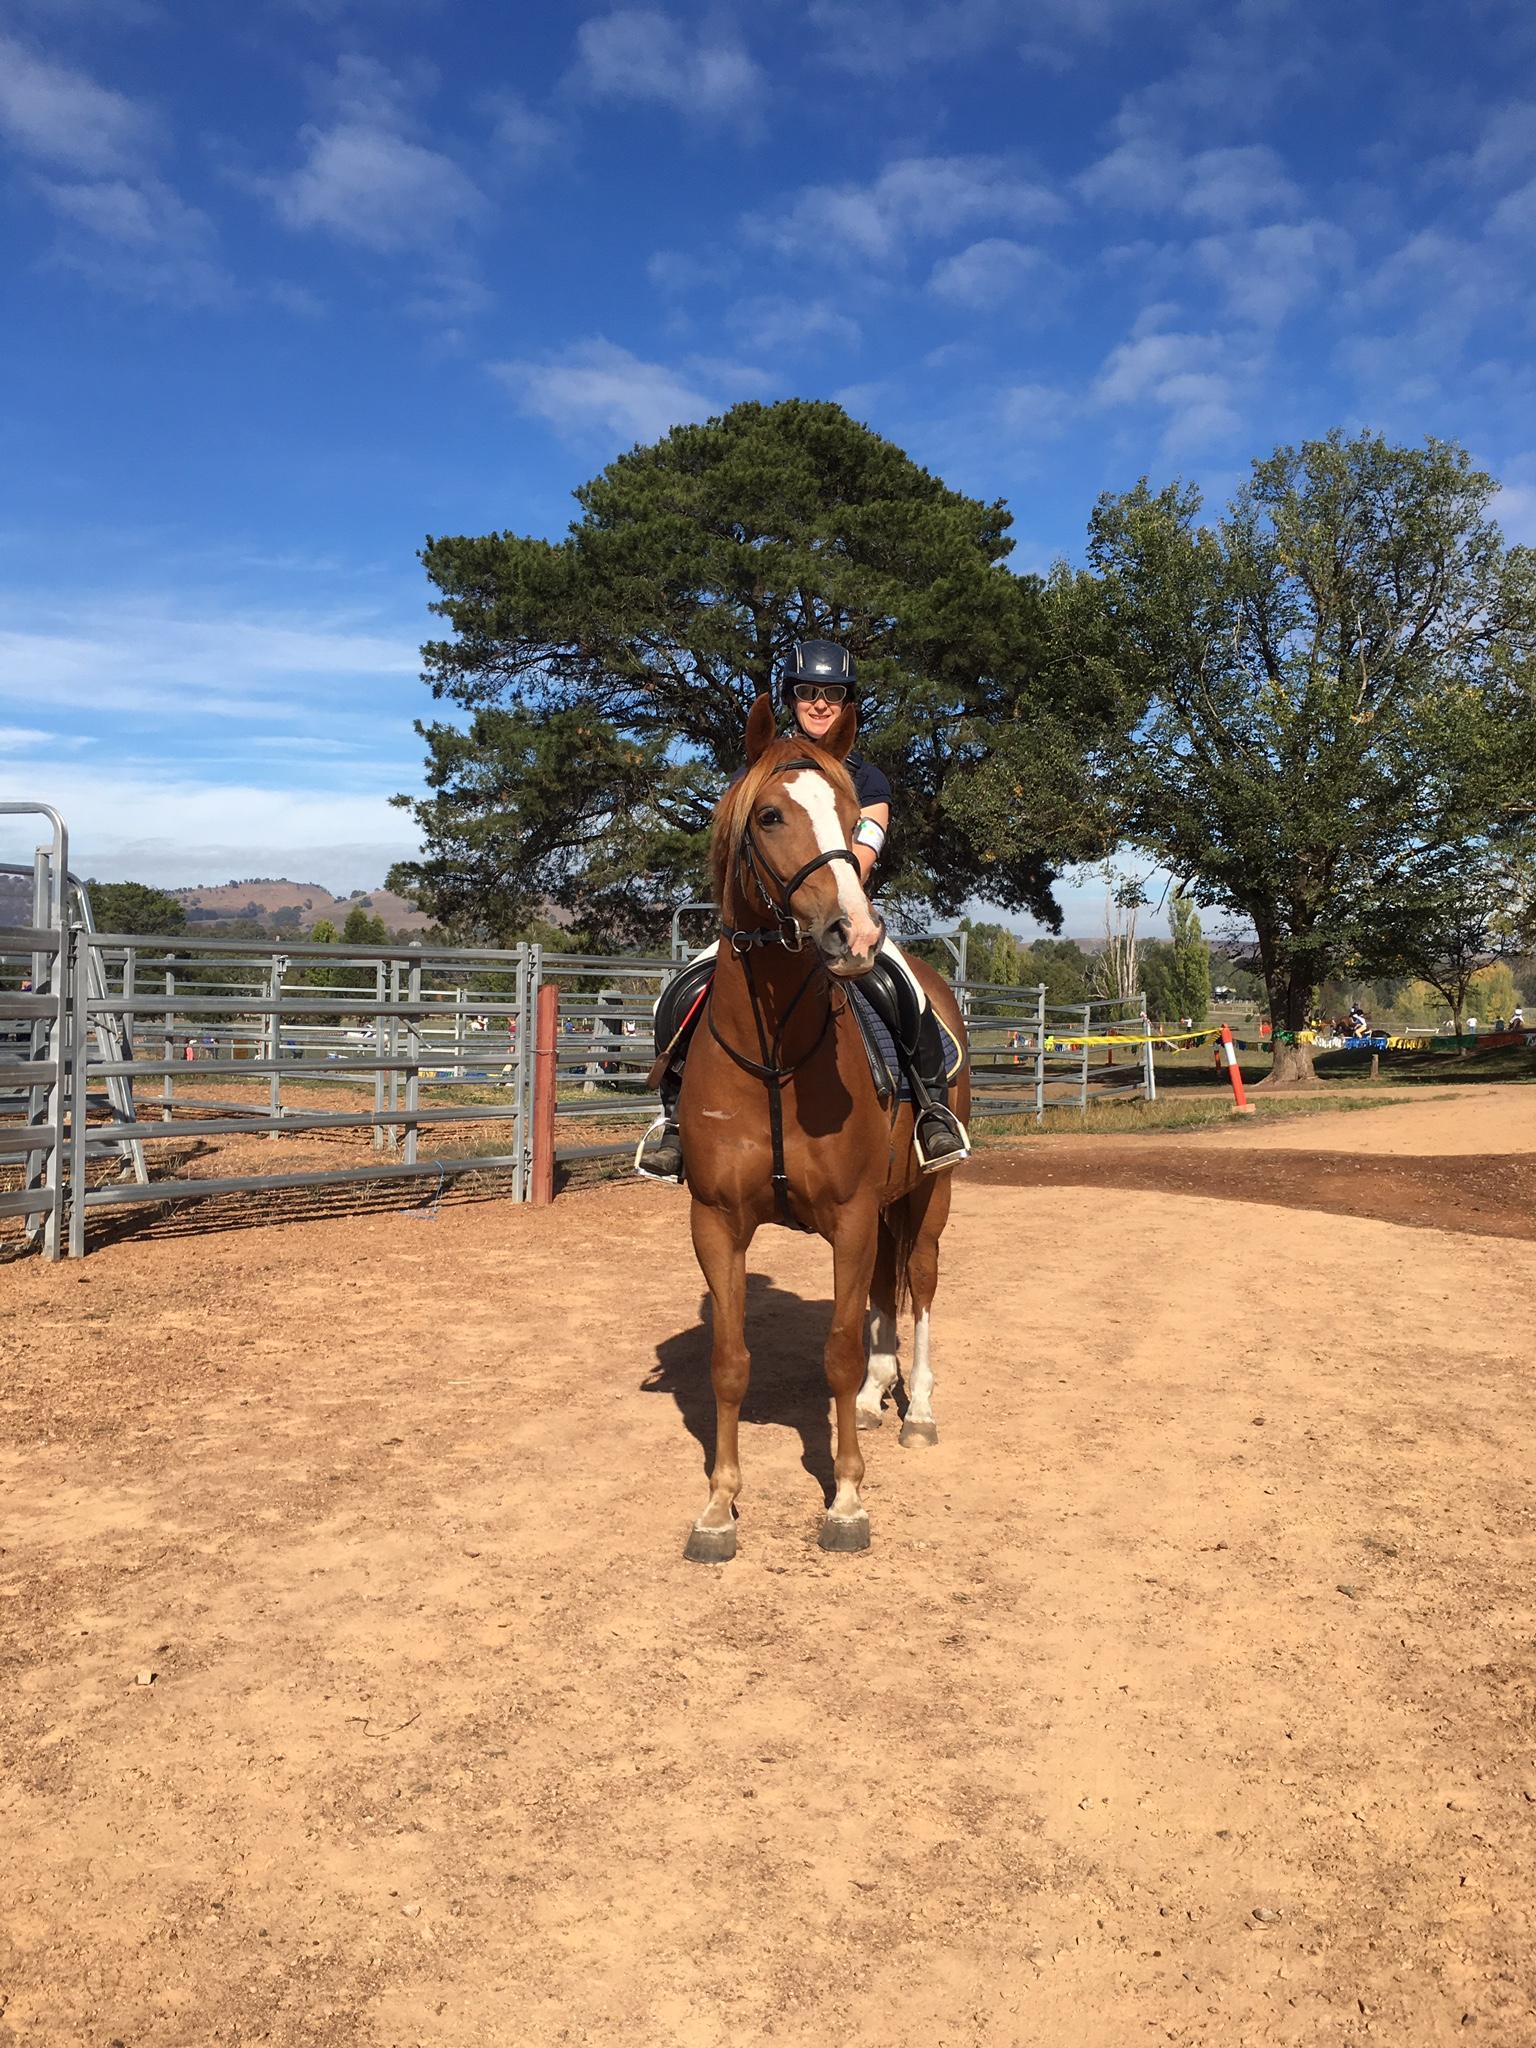 Australian Stockhorse gelding Reg